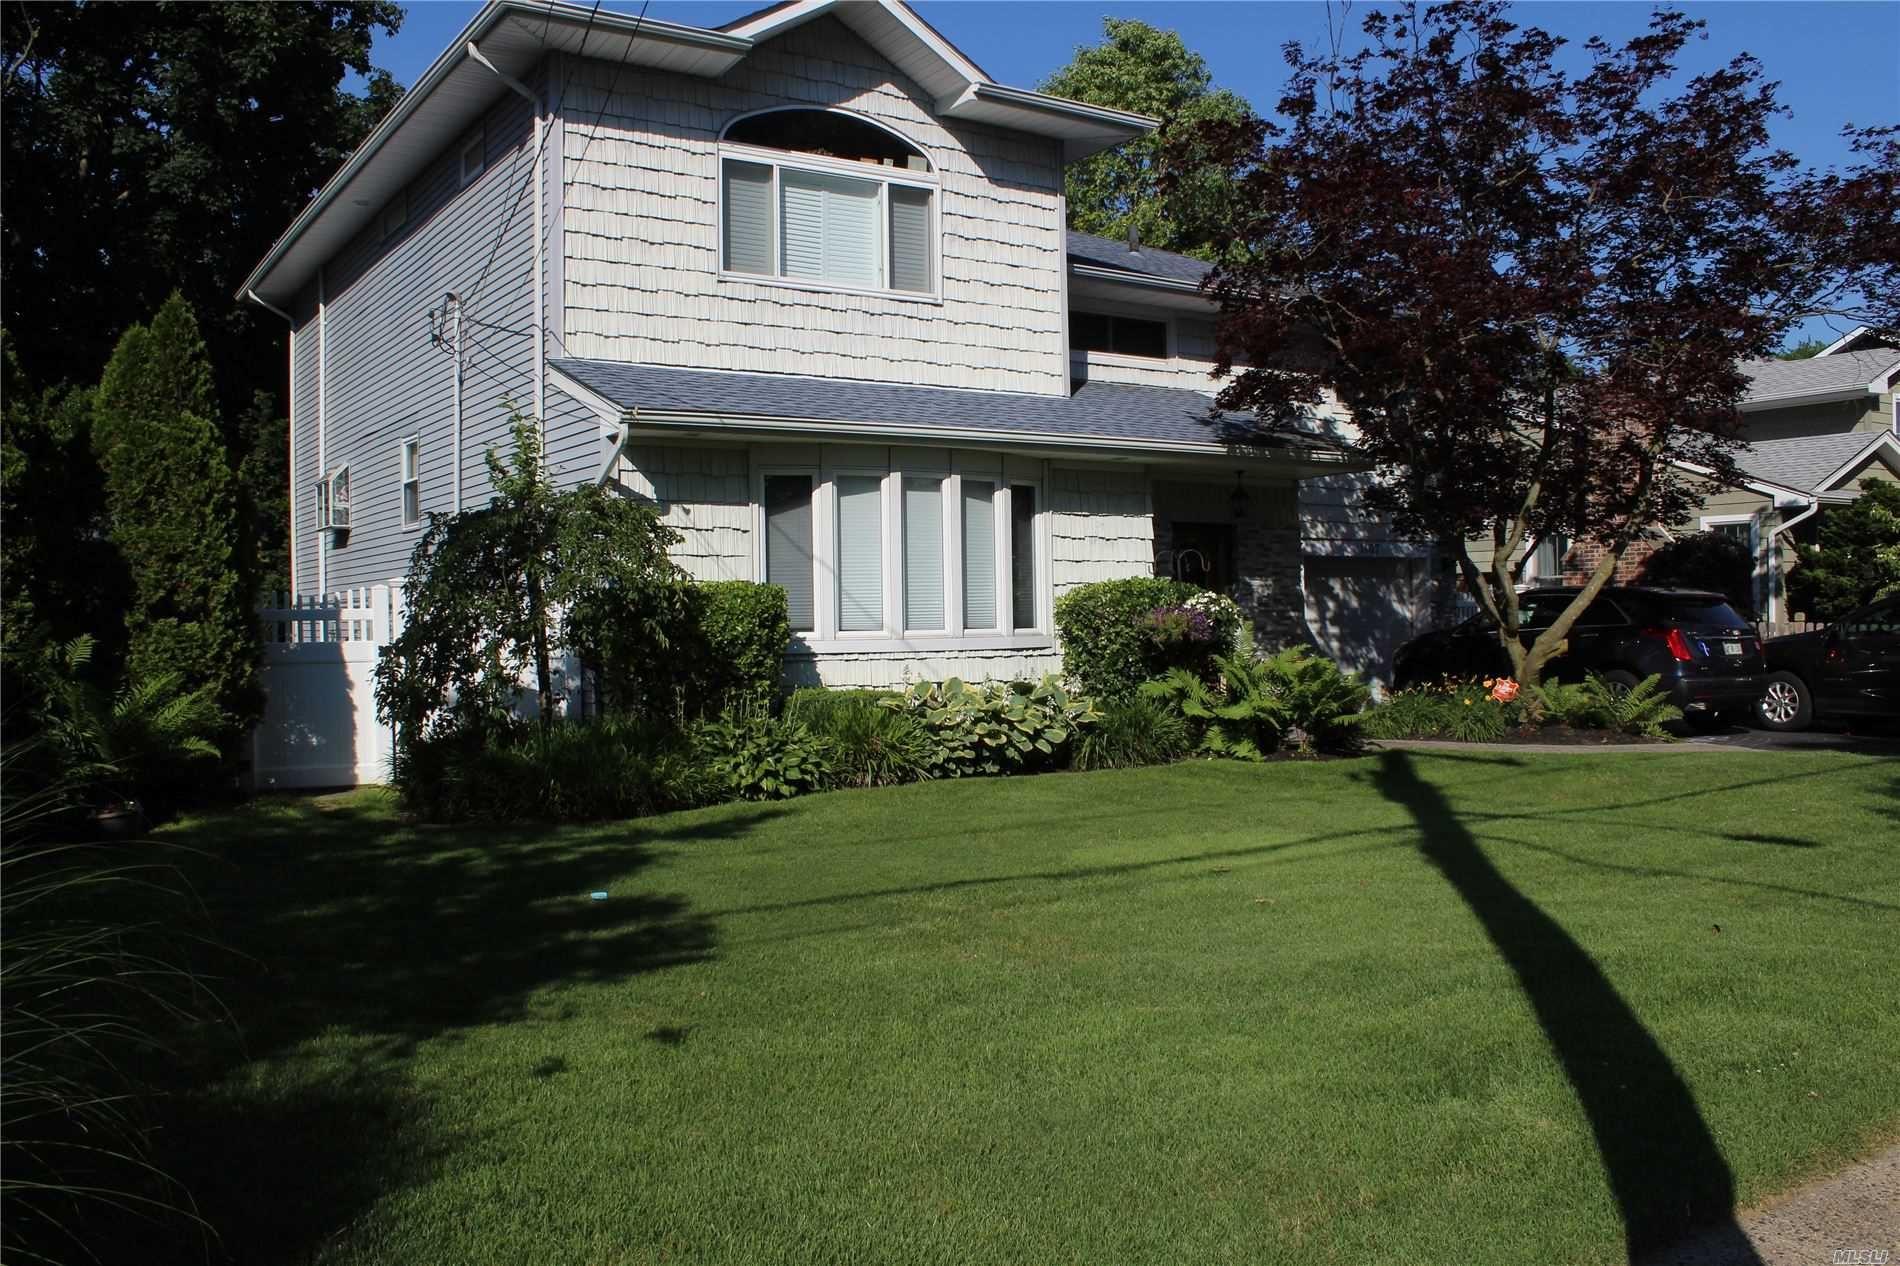 1107 Little Whaleneck Road, Merrick, NY 11566 - MLS#: 3225350